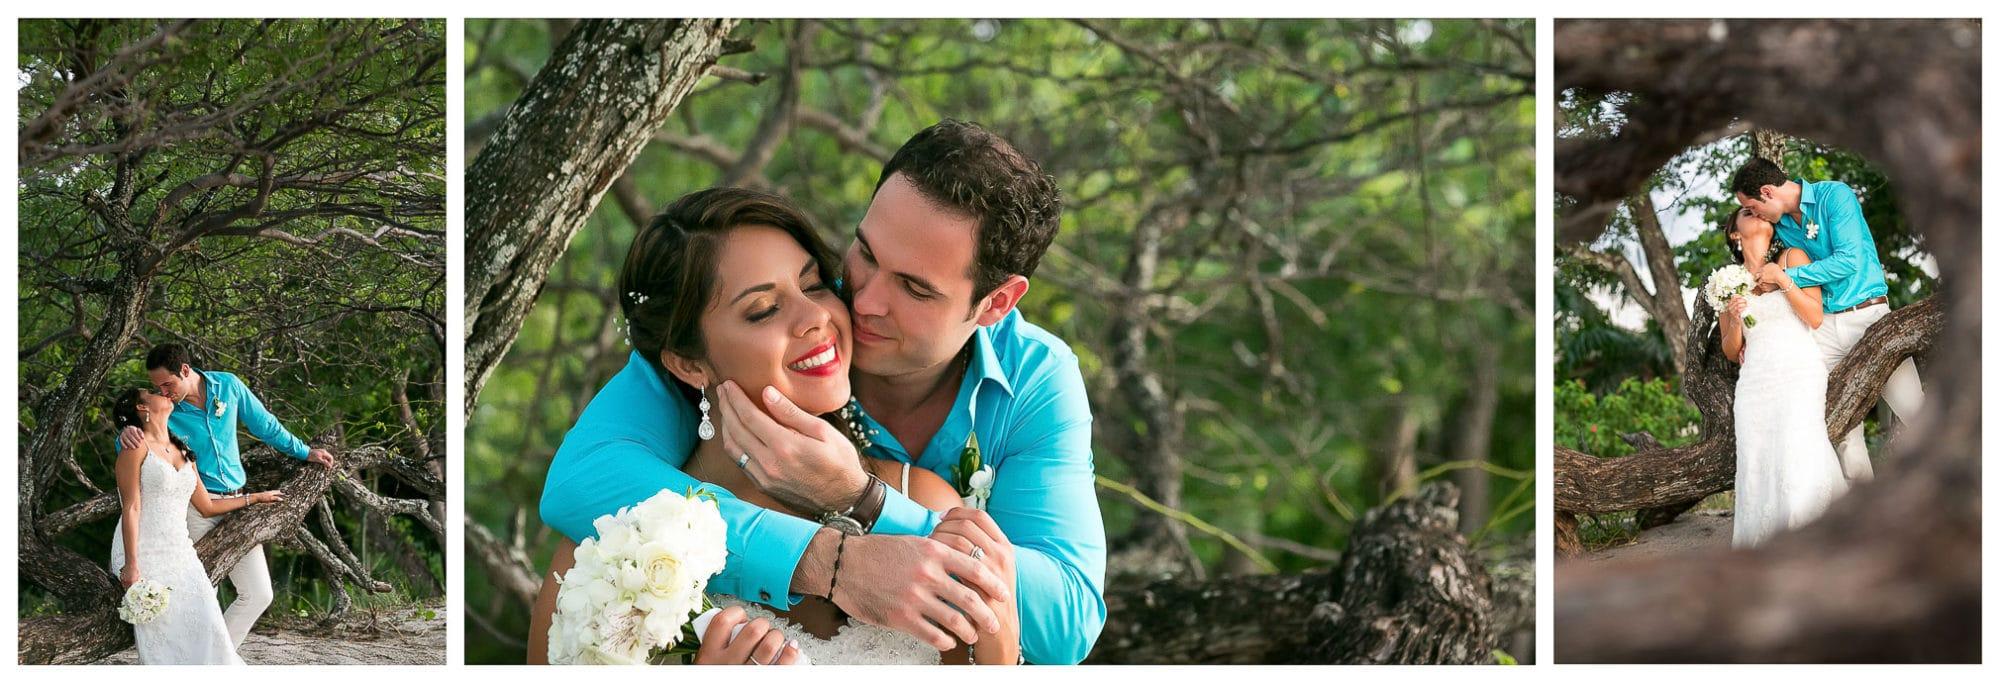 Wedding photography in Costa Rica.